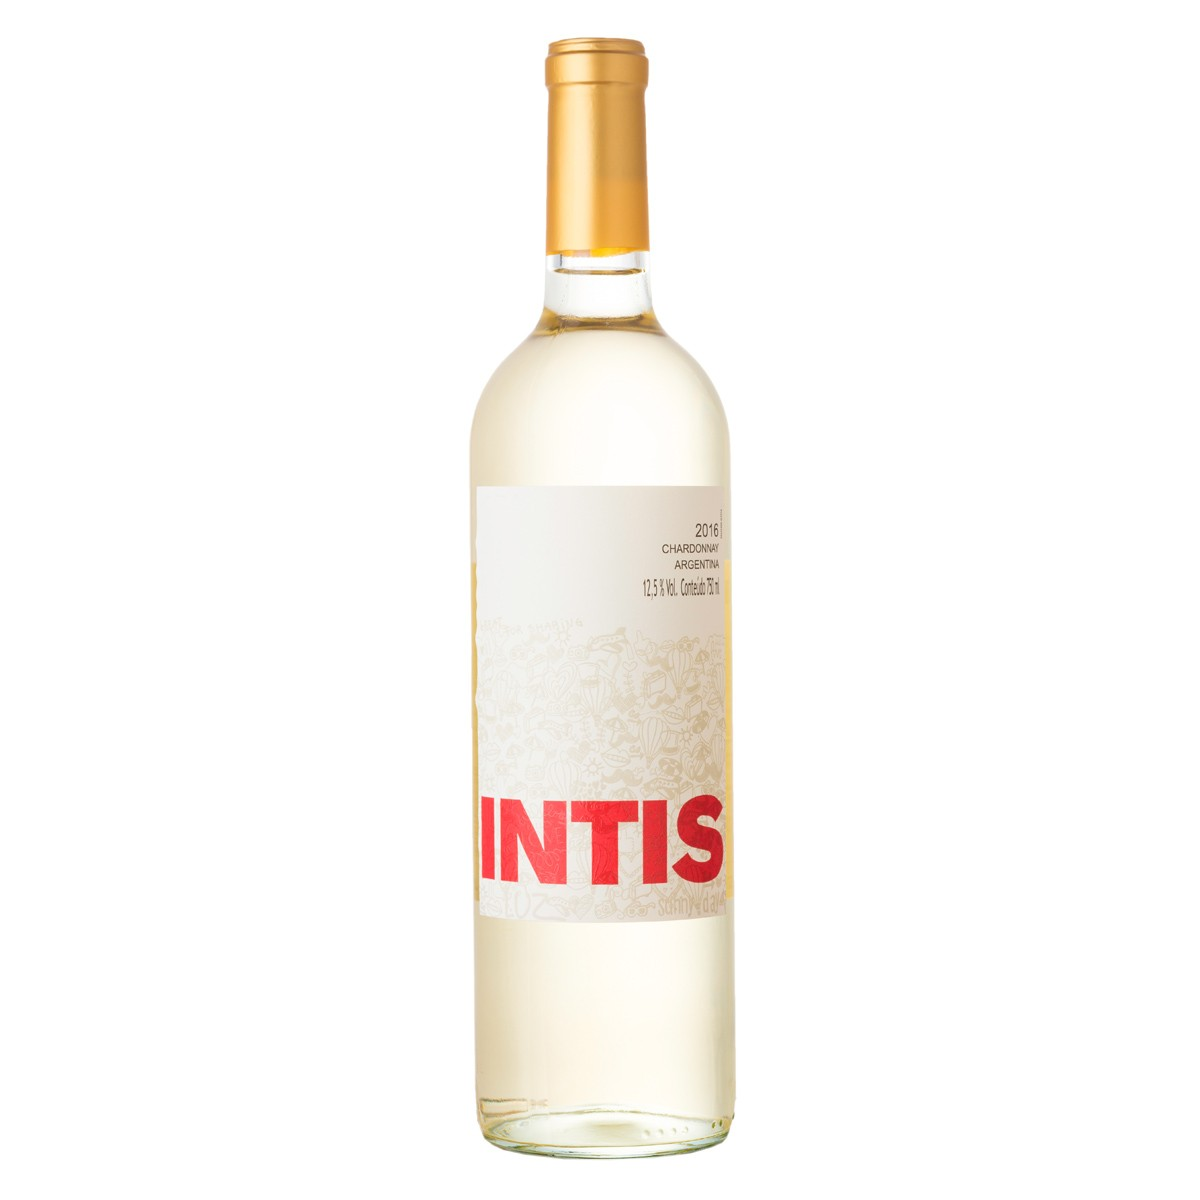 Intis Chardonnay